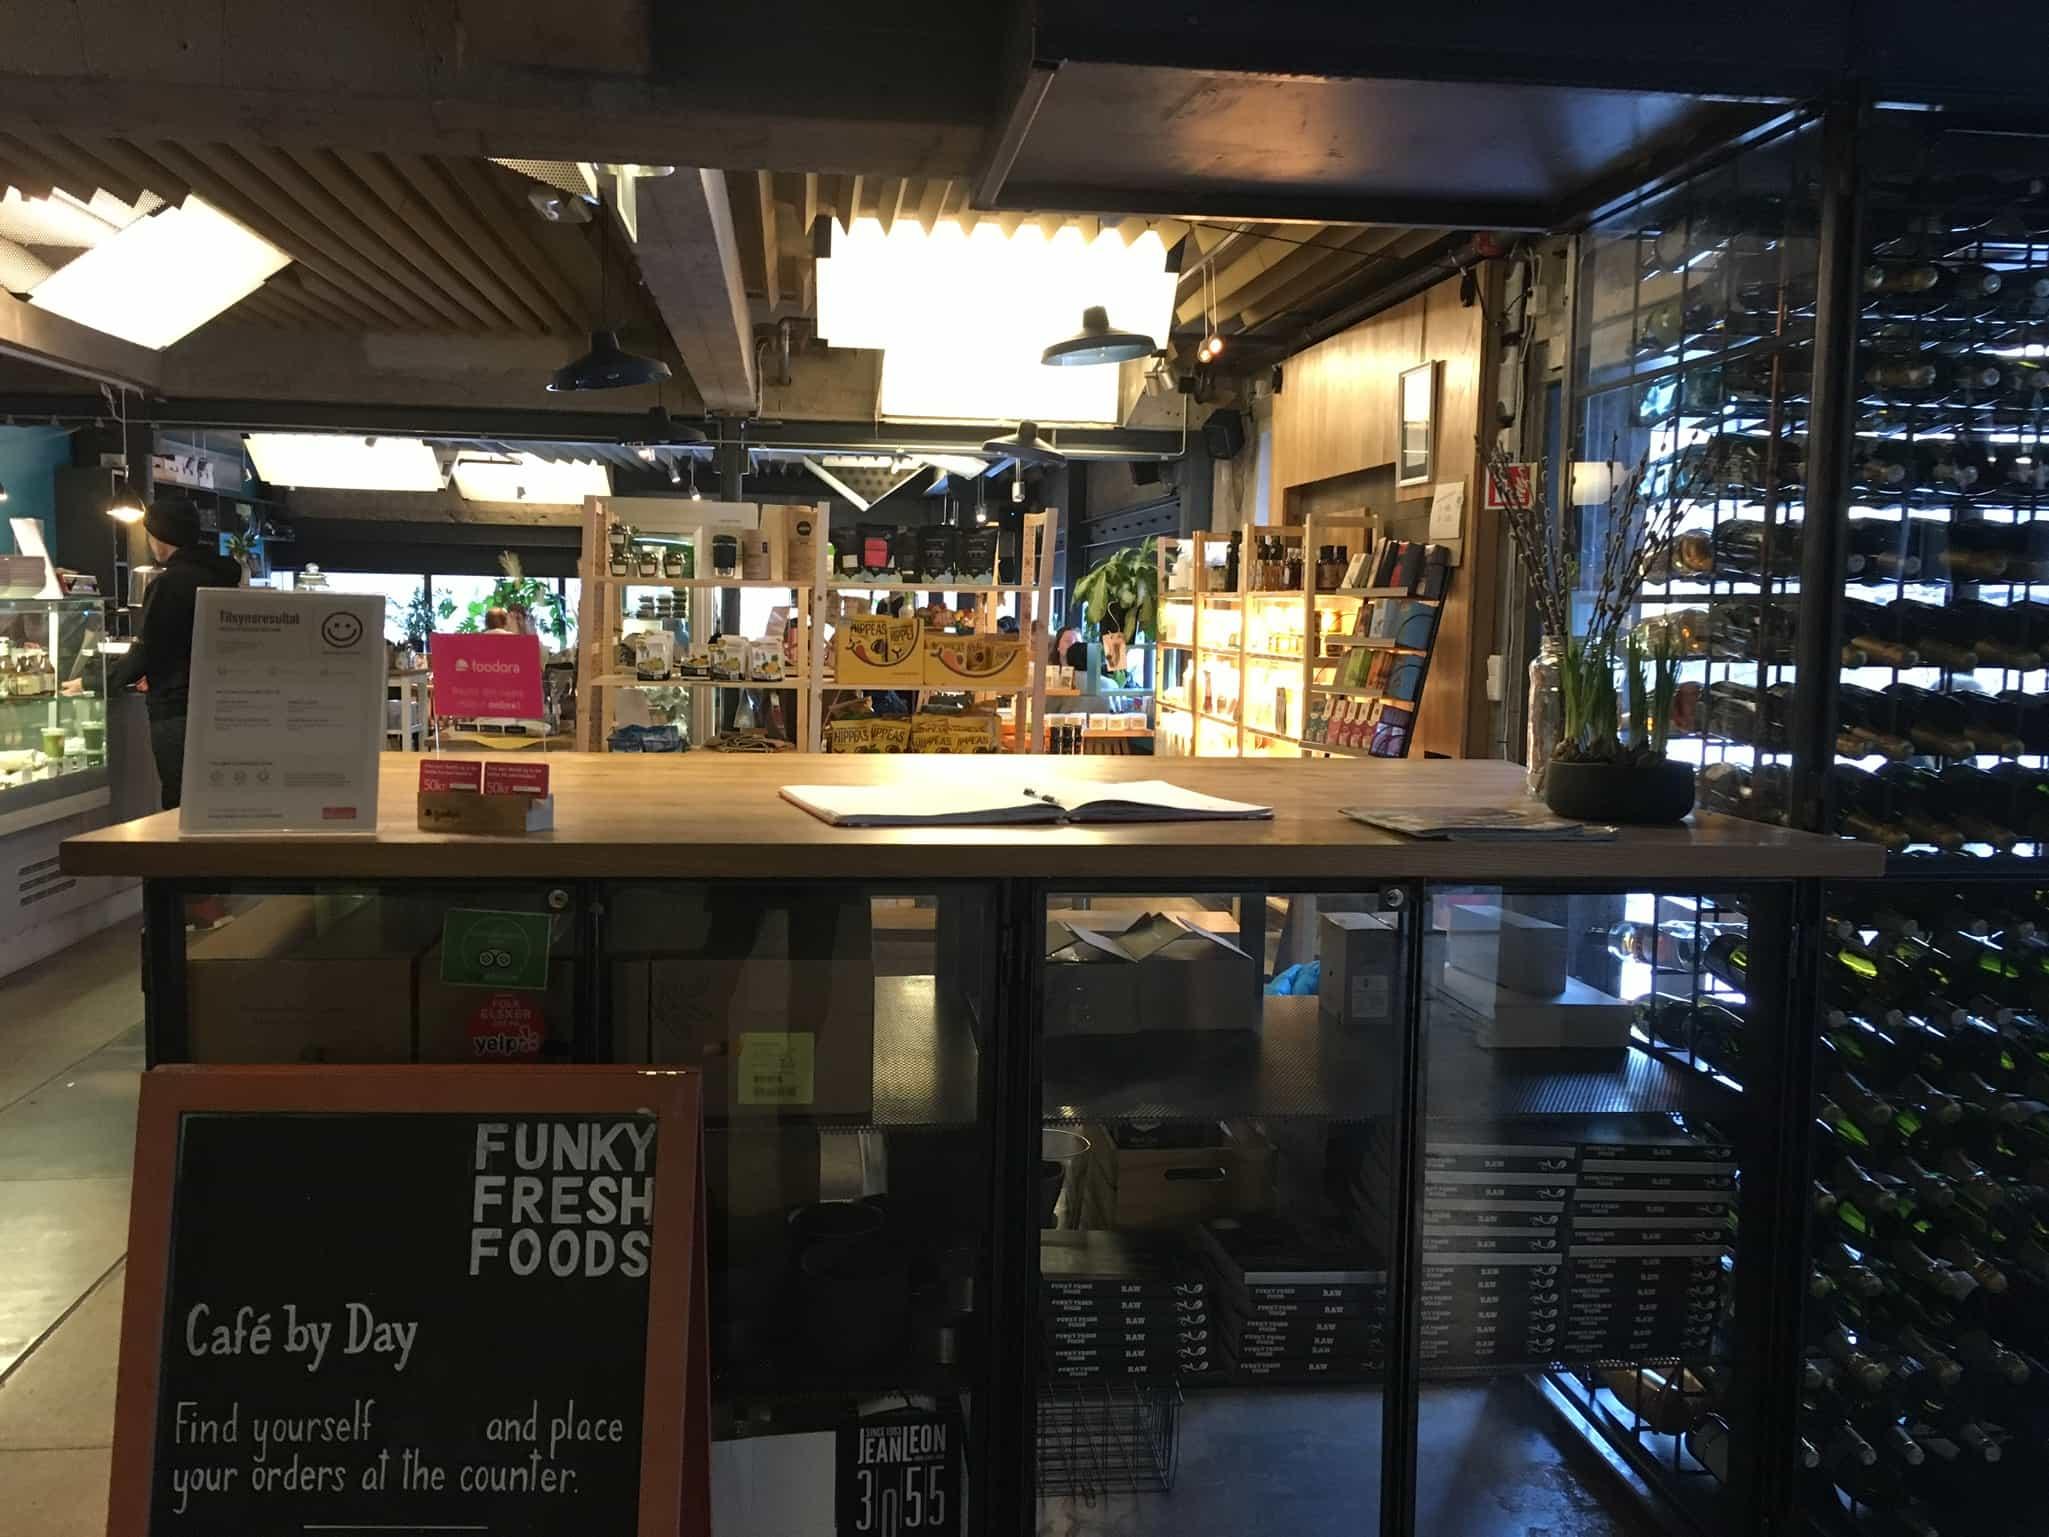 Oslo - Funky Fresh Foods - Eingang